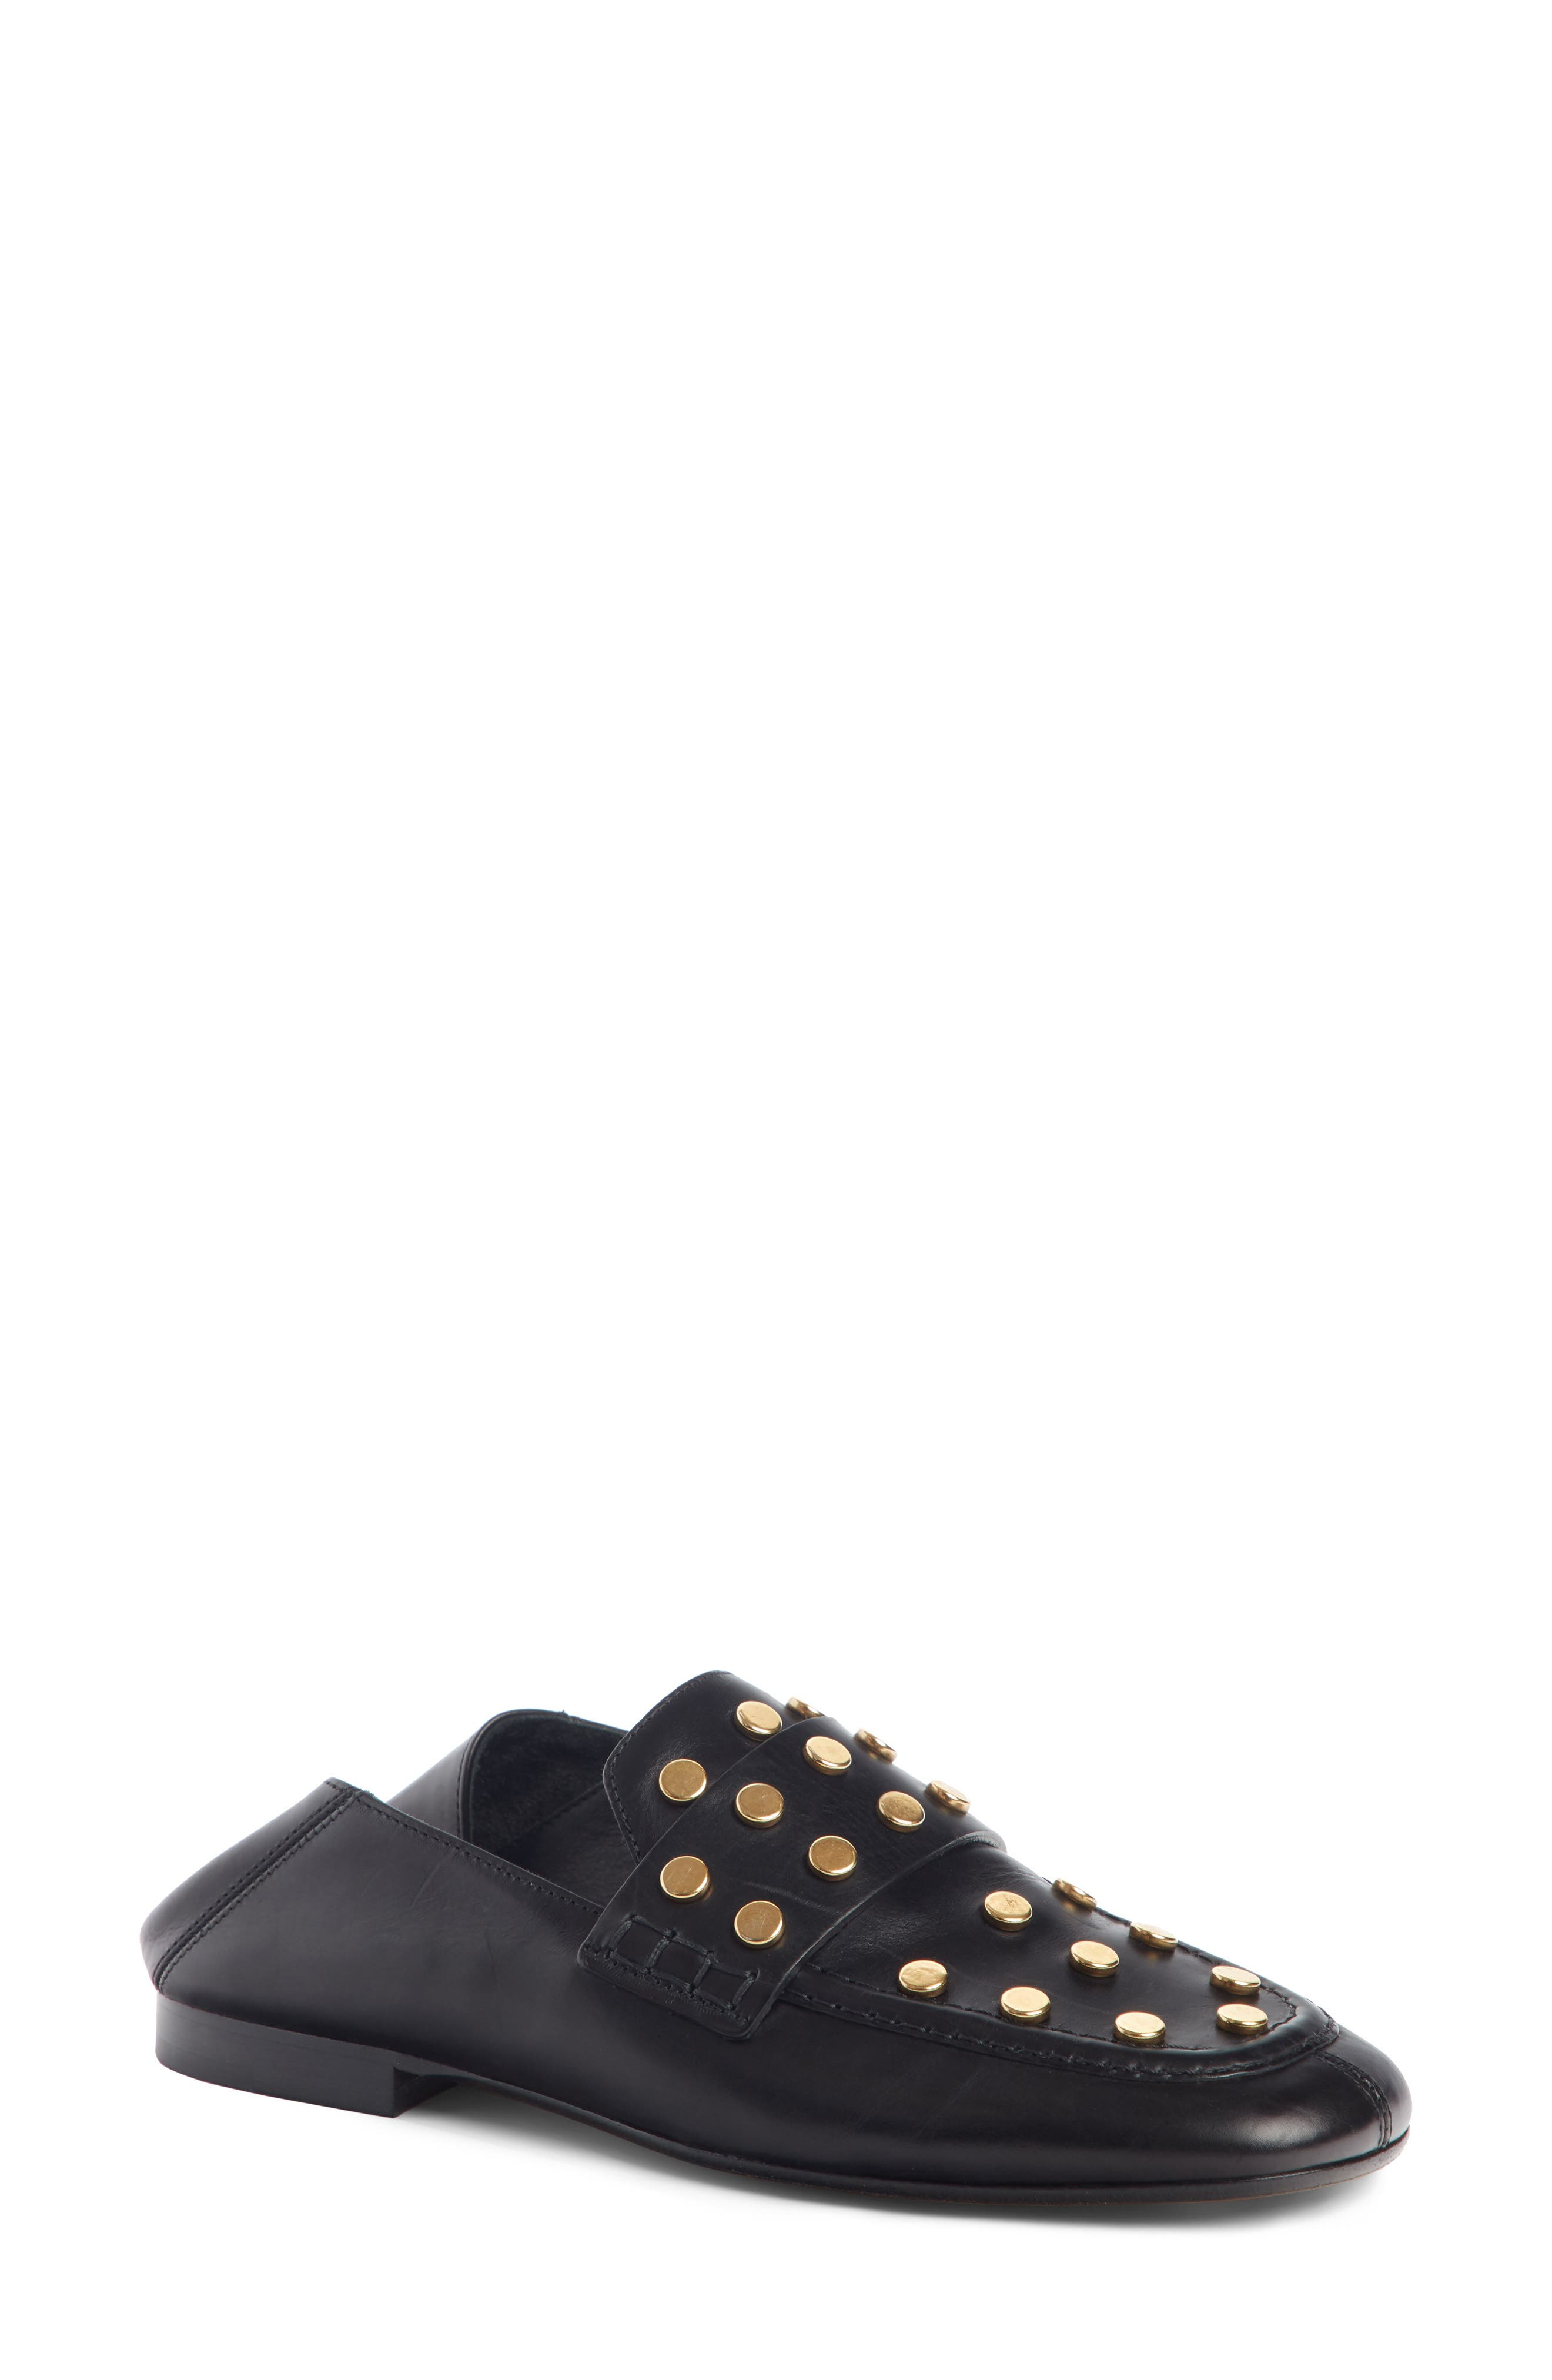 Isabel Marant Feenie Studded Convertible Loafer (Women)